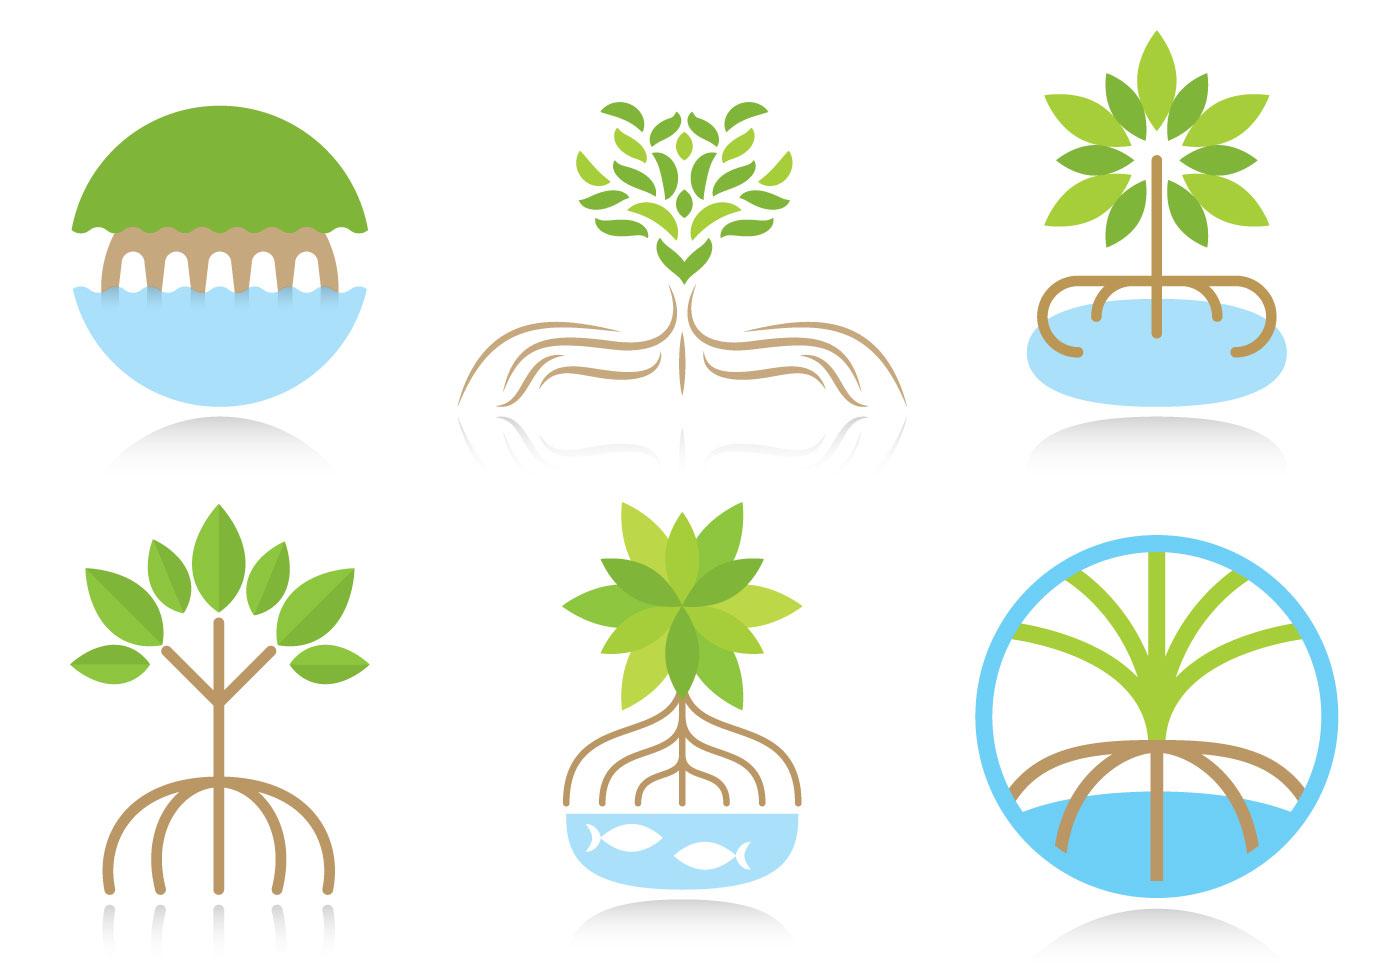 Mangrove logo vectors download free vector art stock graphics